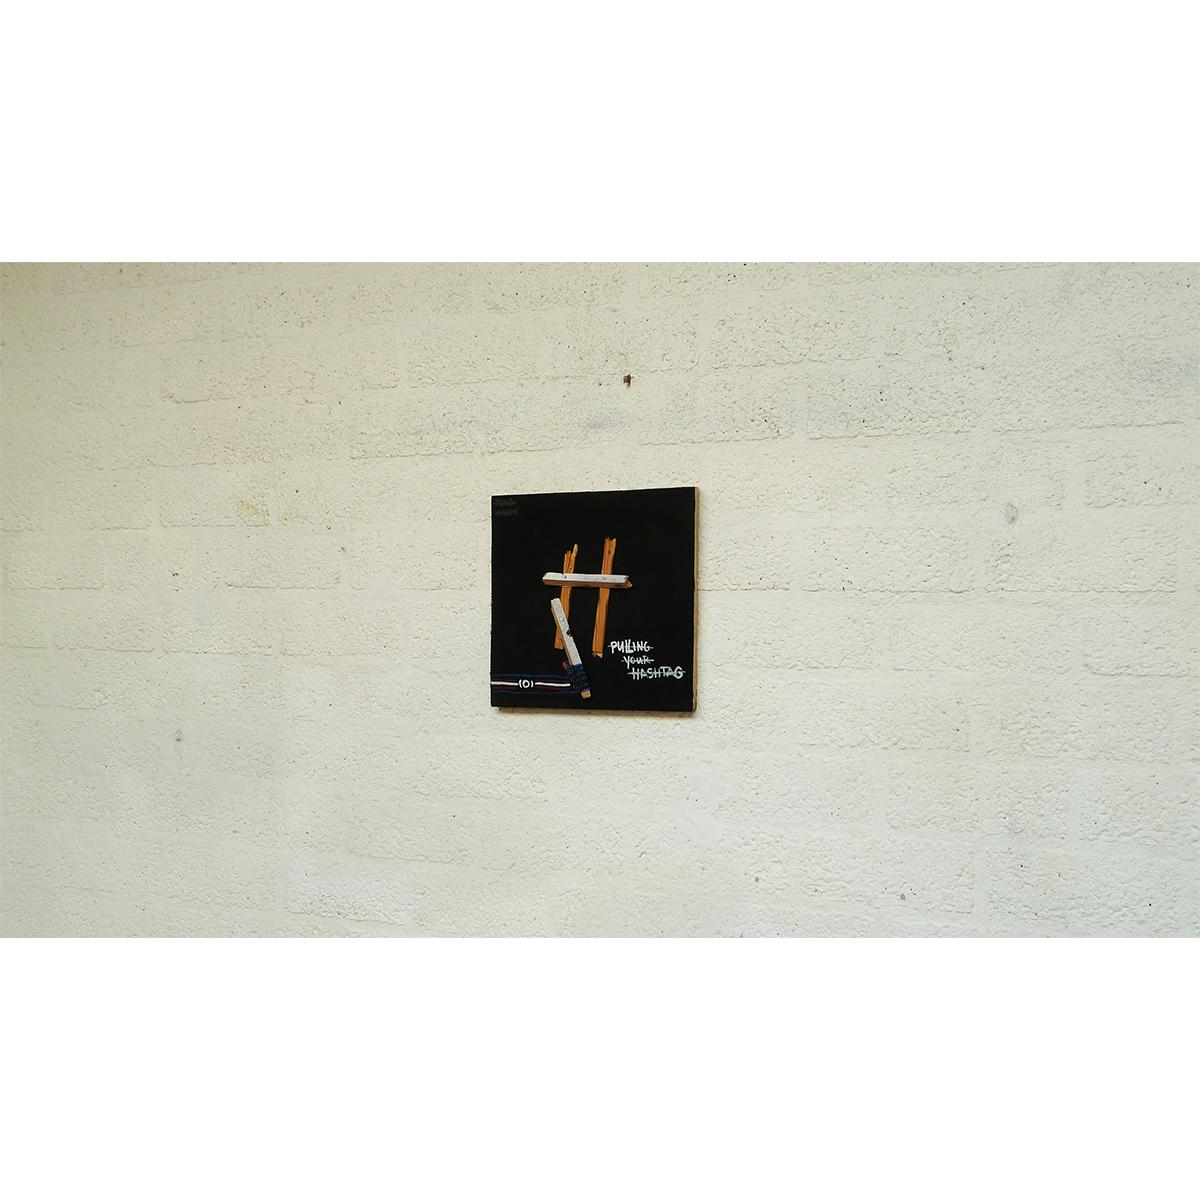 #PULLINGYOURHASHTAG 03 - Frank Willems